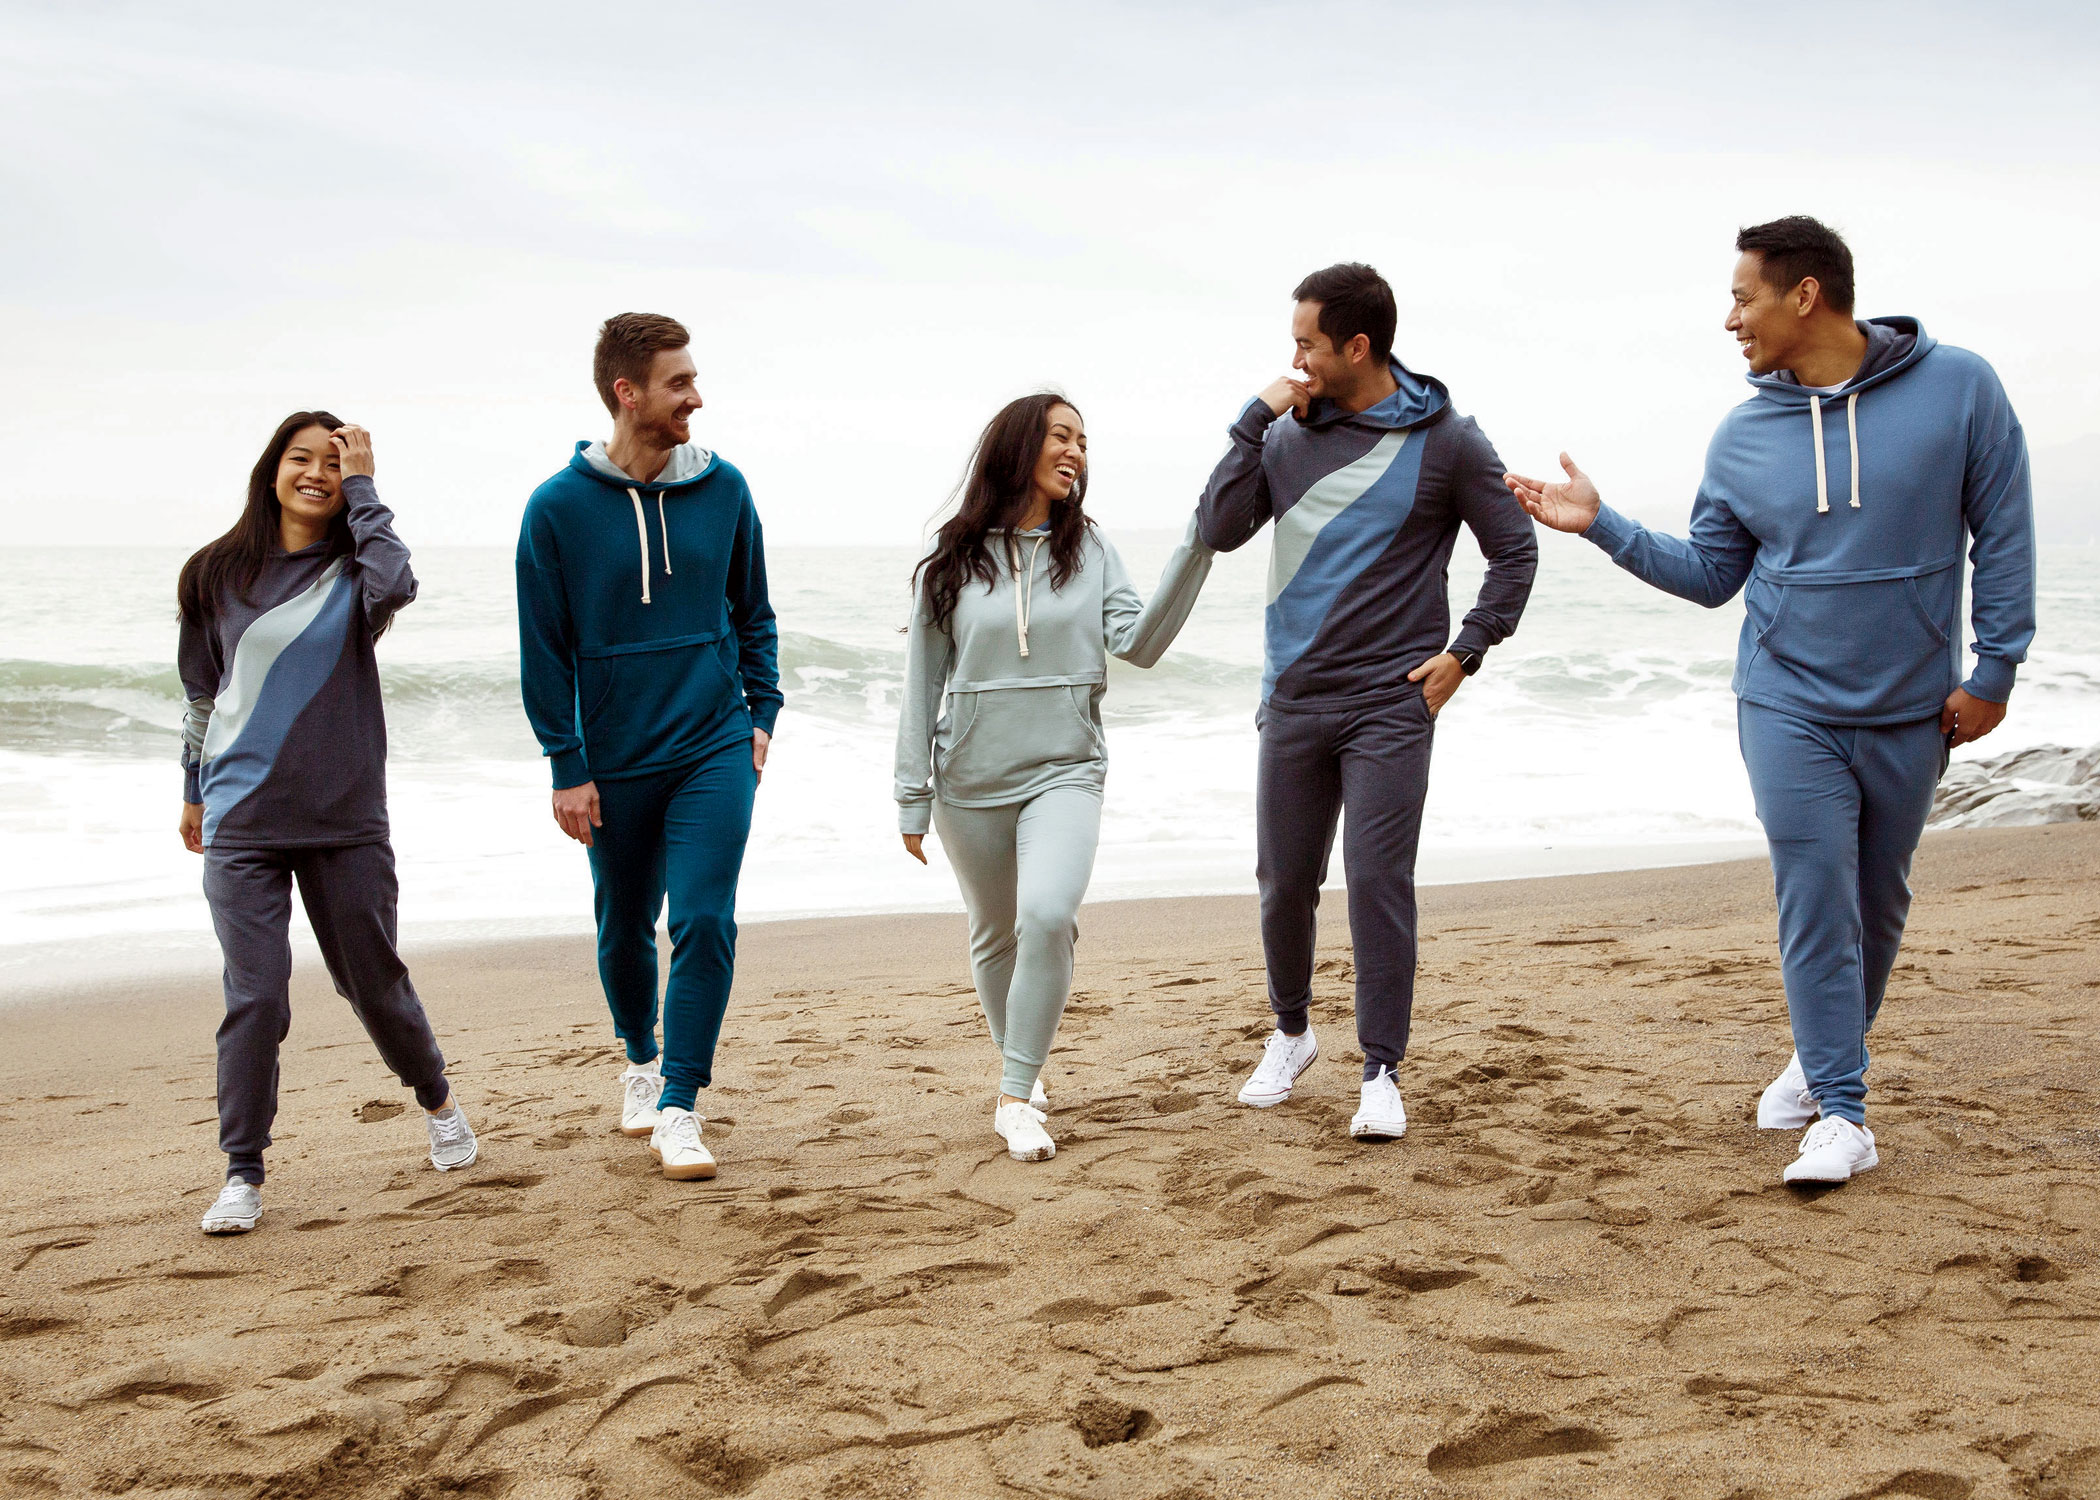 ATMUS San Francisco clothing brand